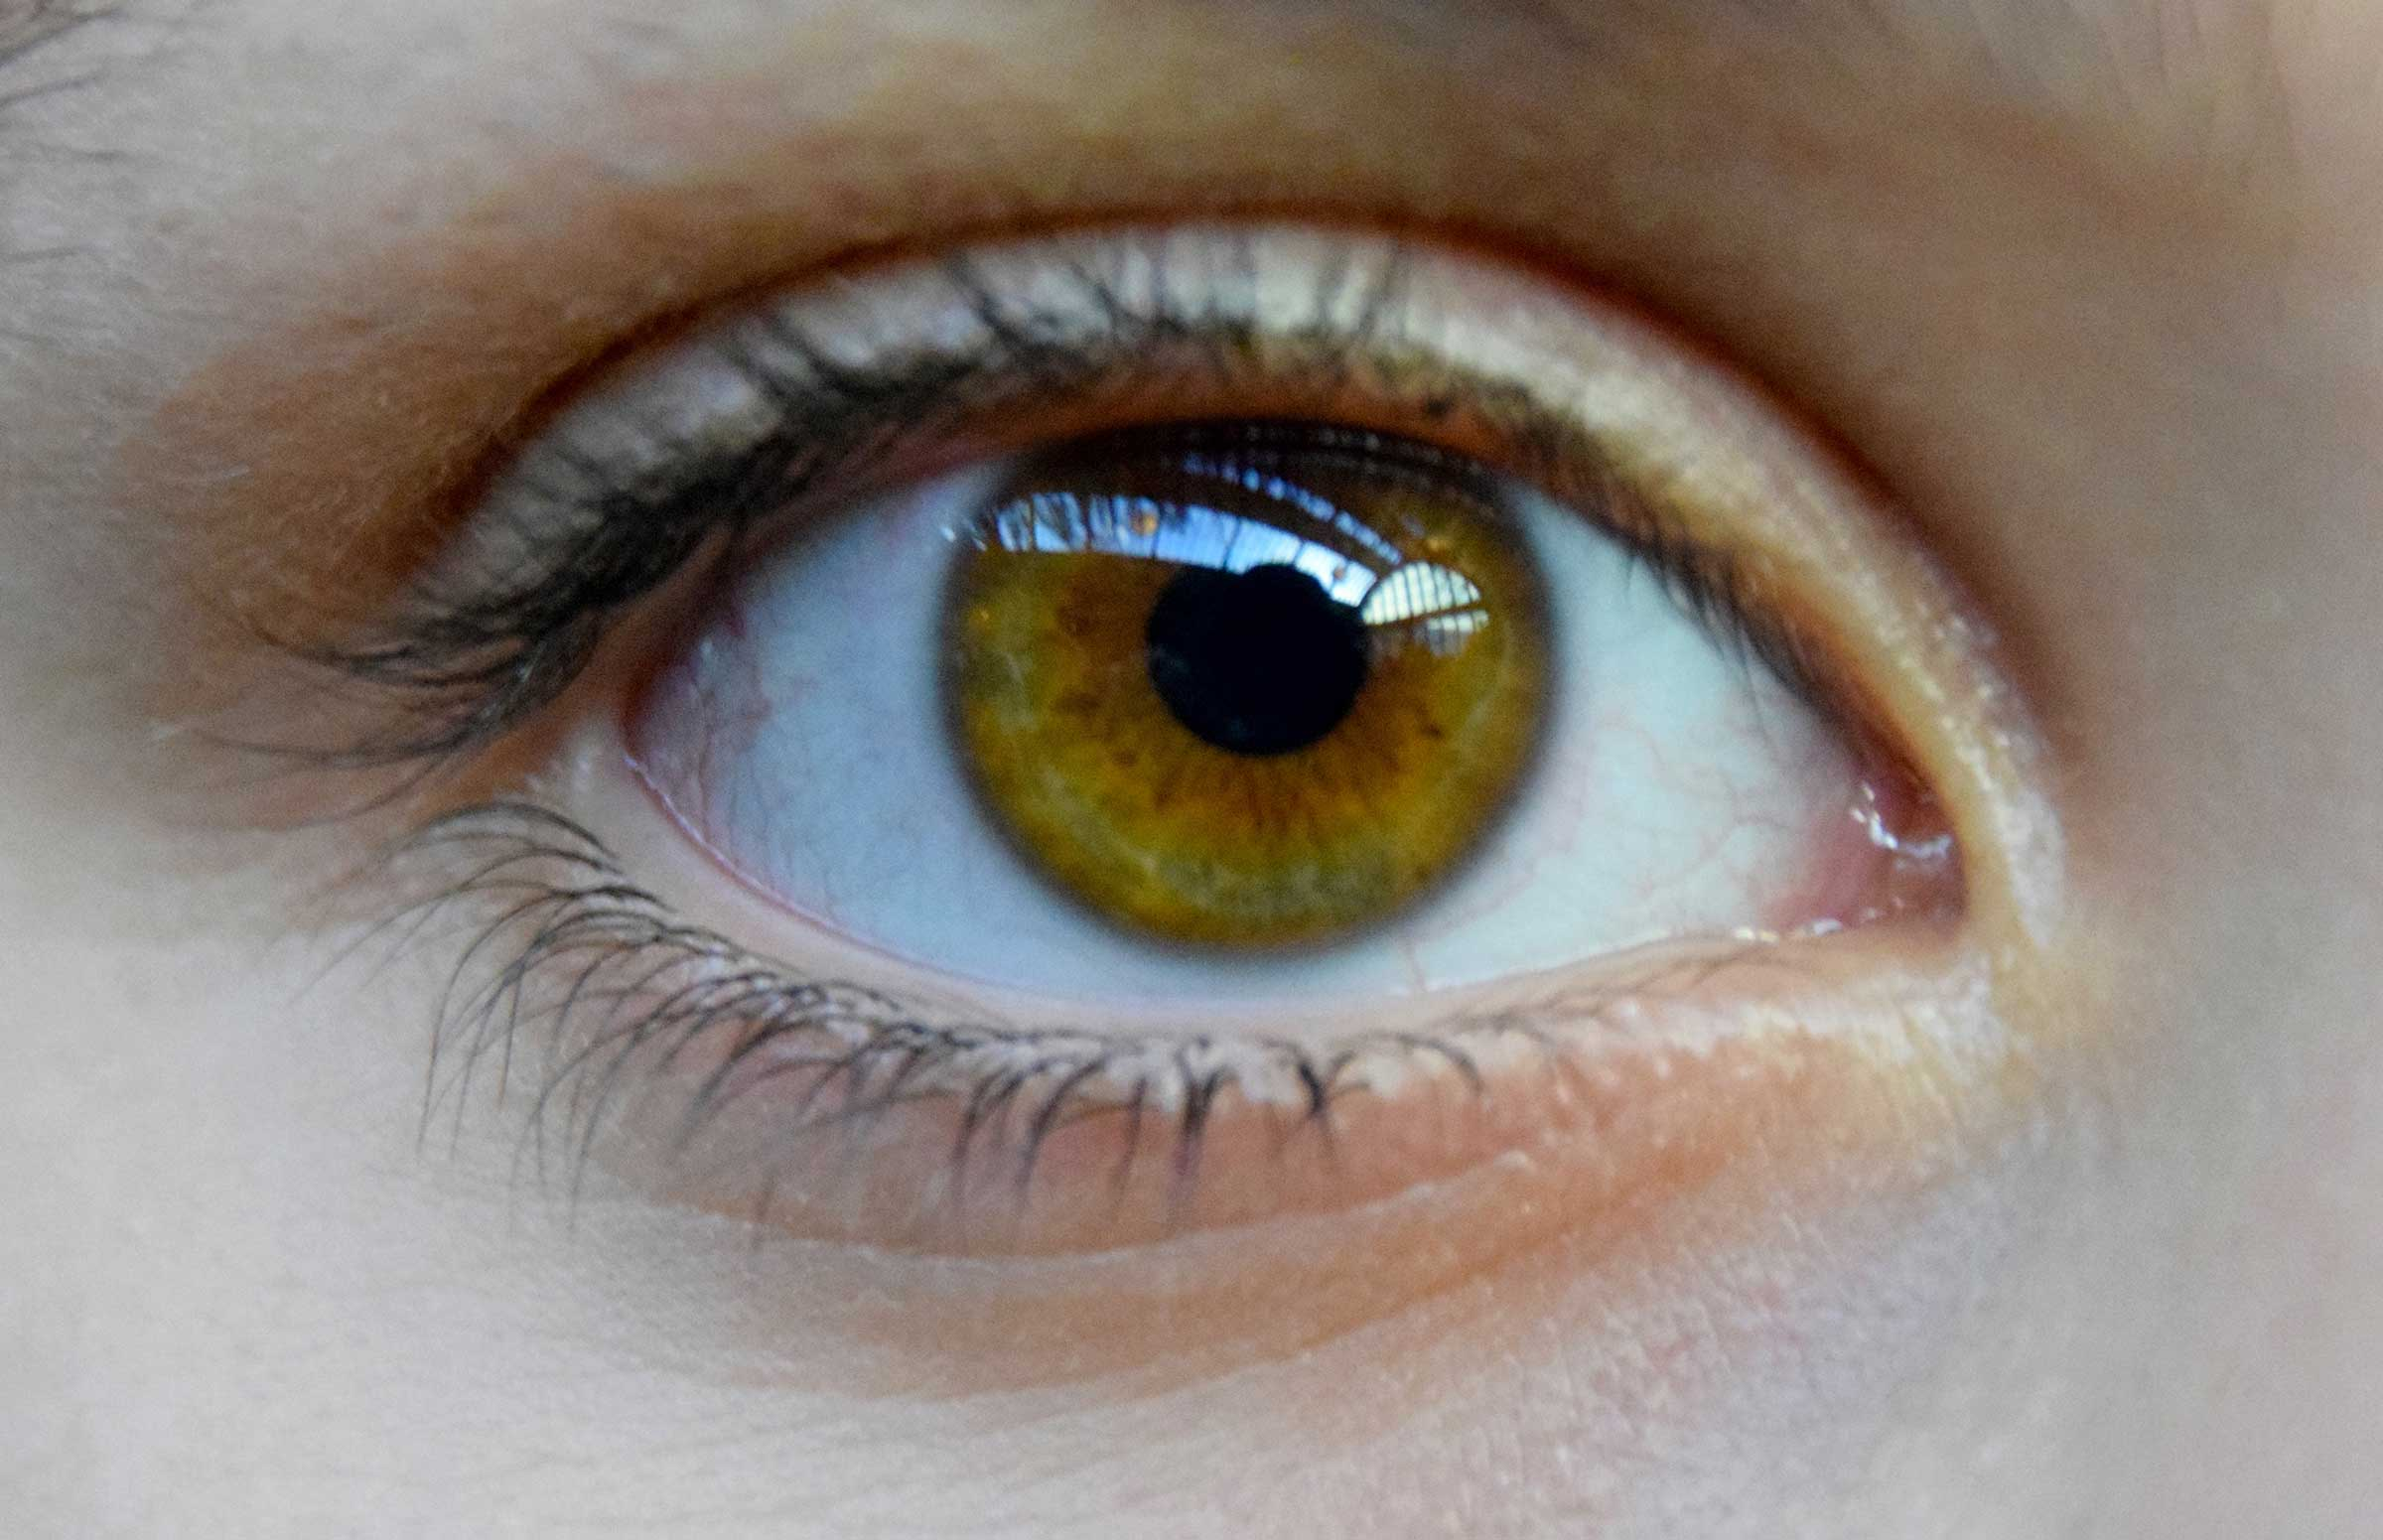 Closeup photo of golden brown eyeball.